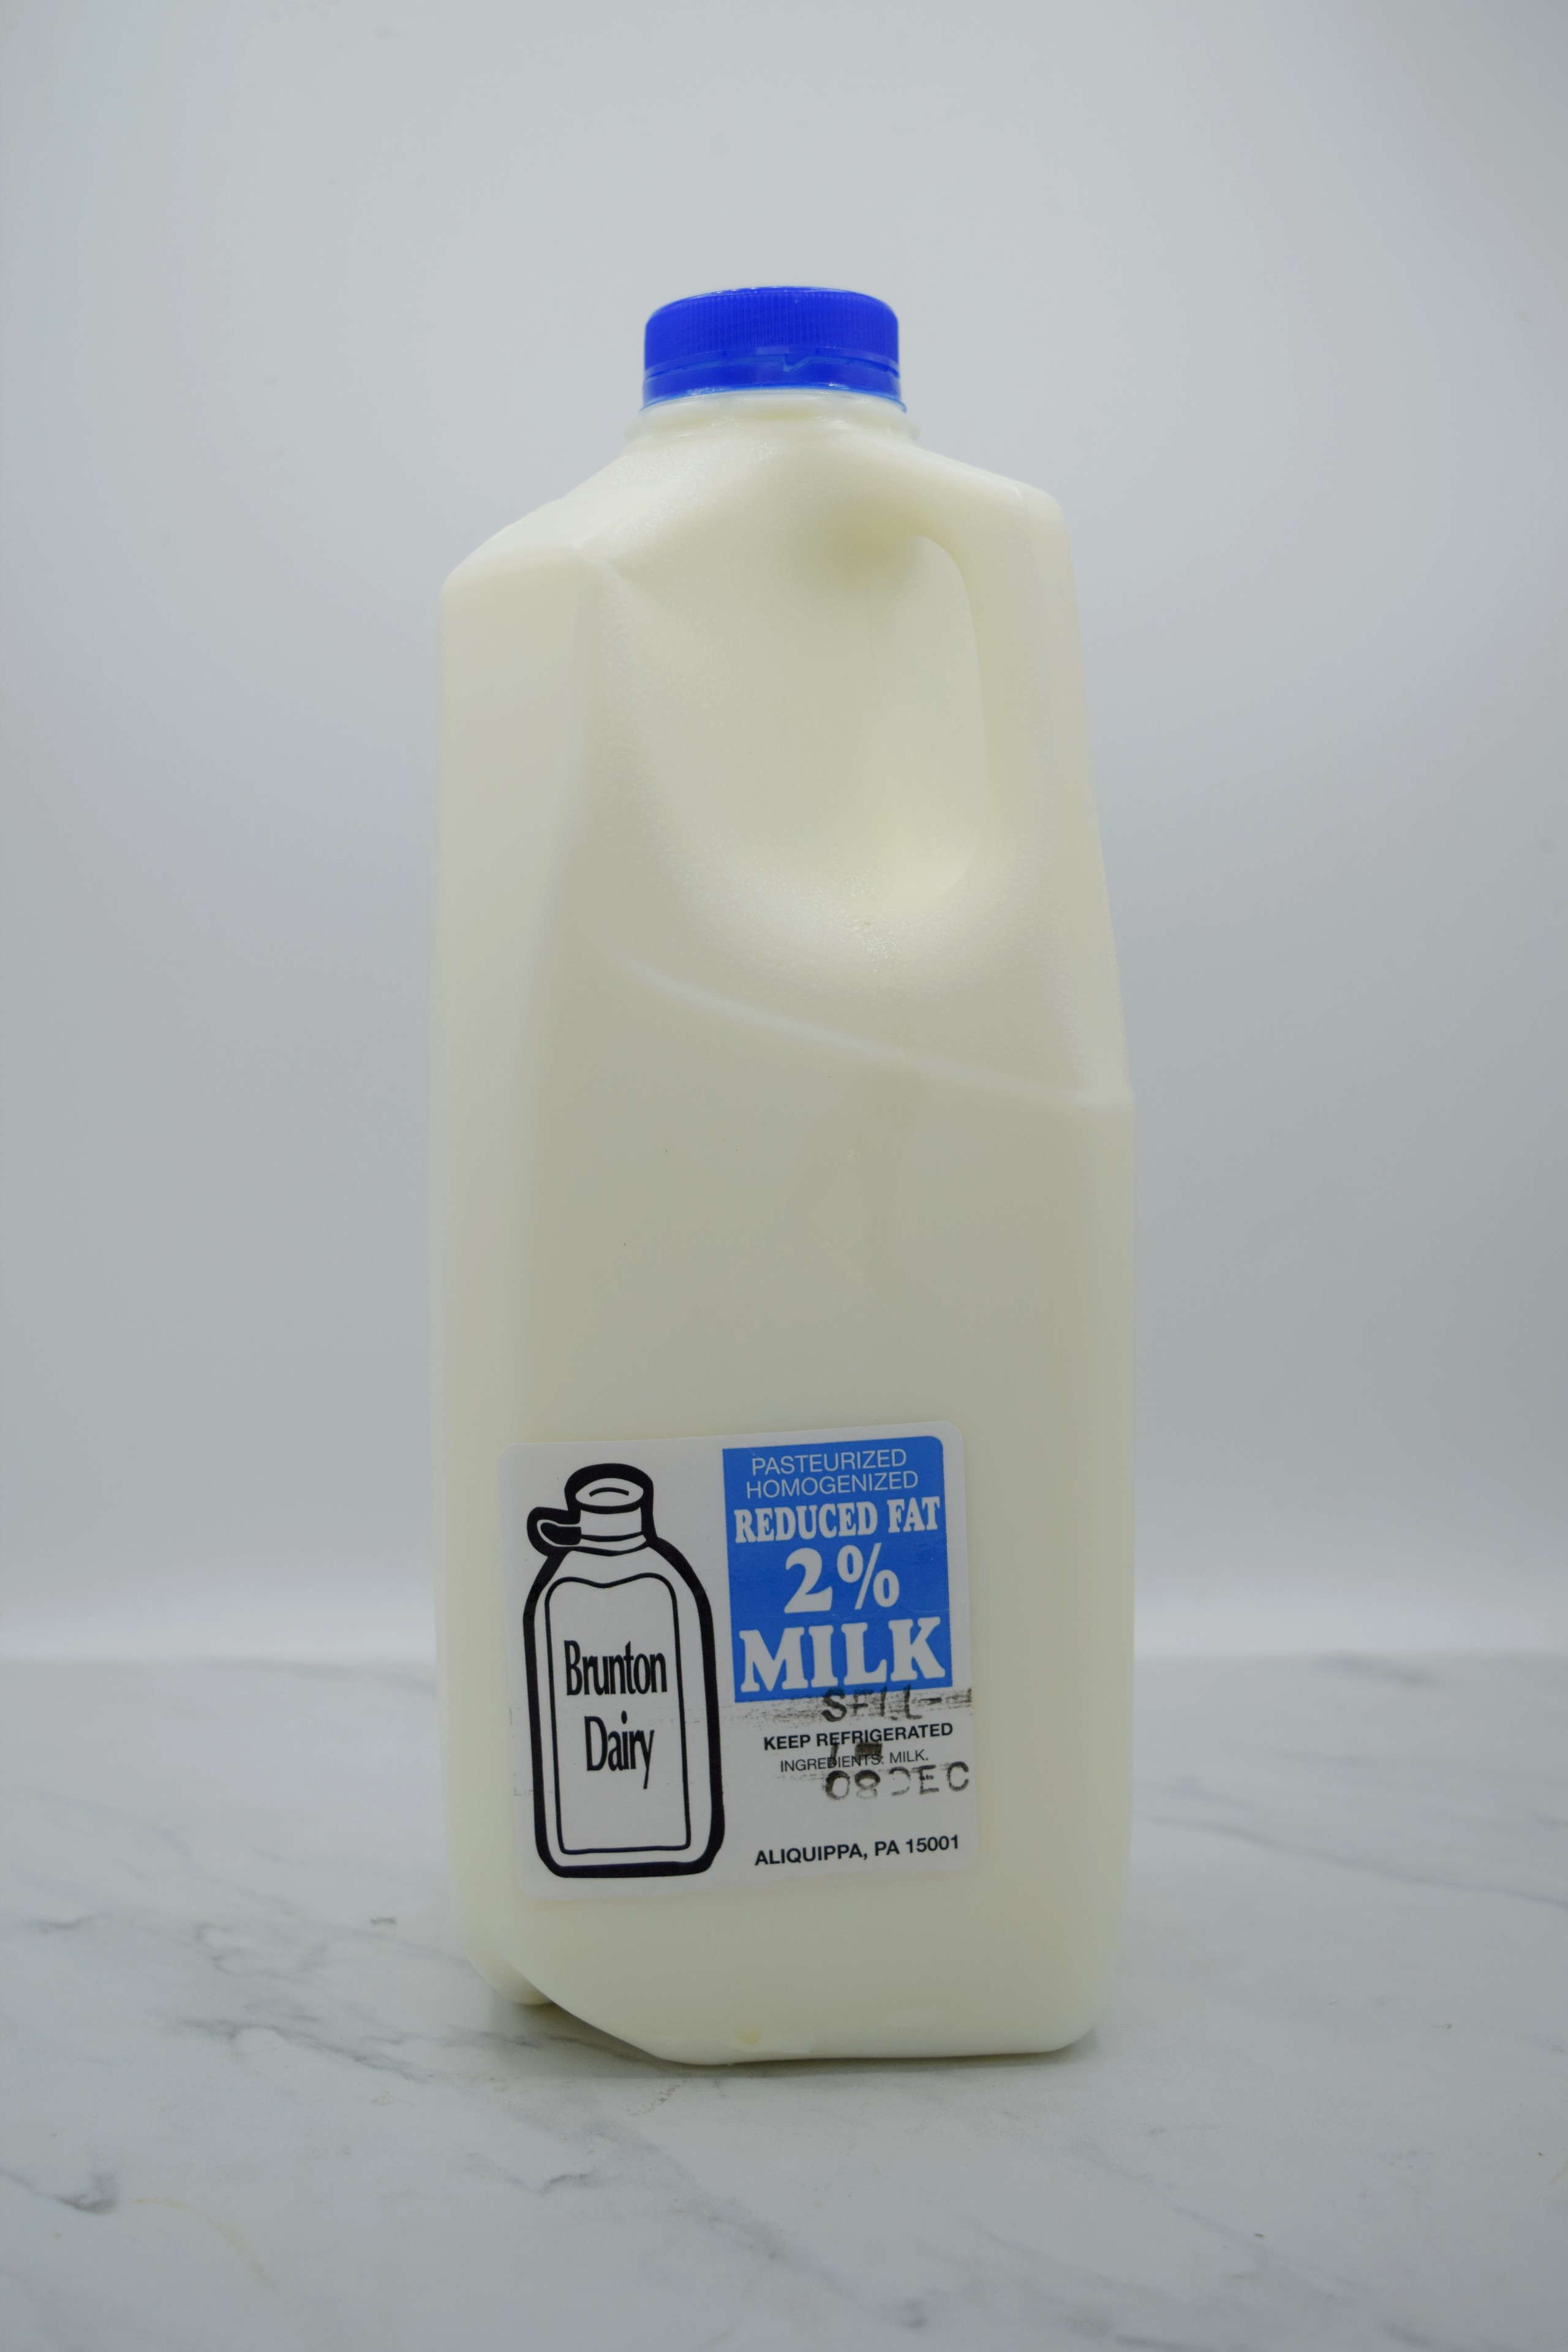 1/2 Gallon 2% Milk